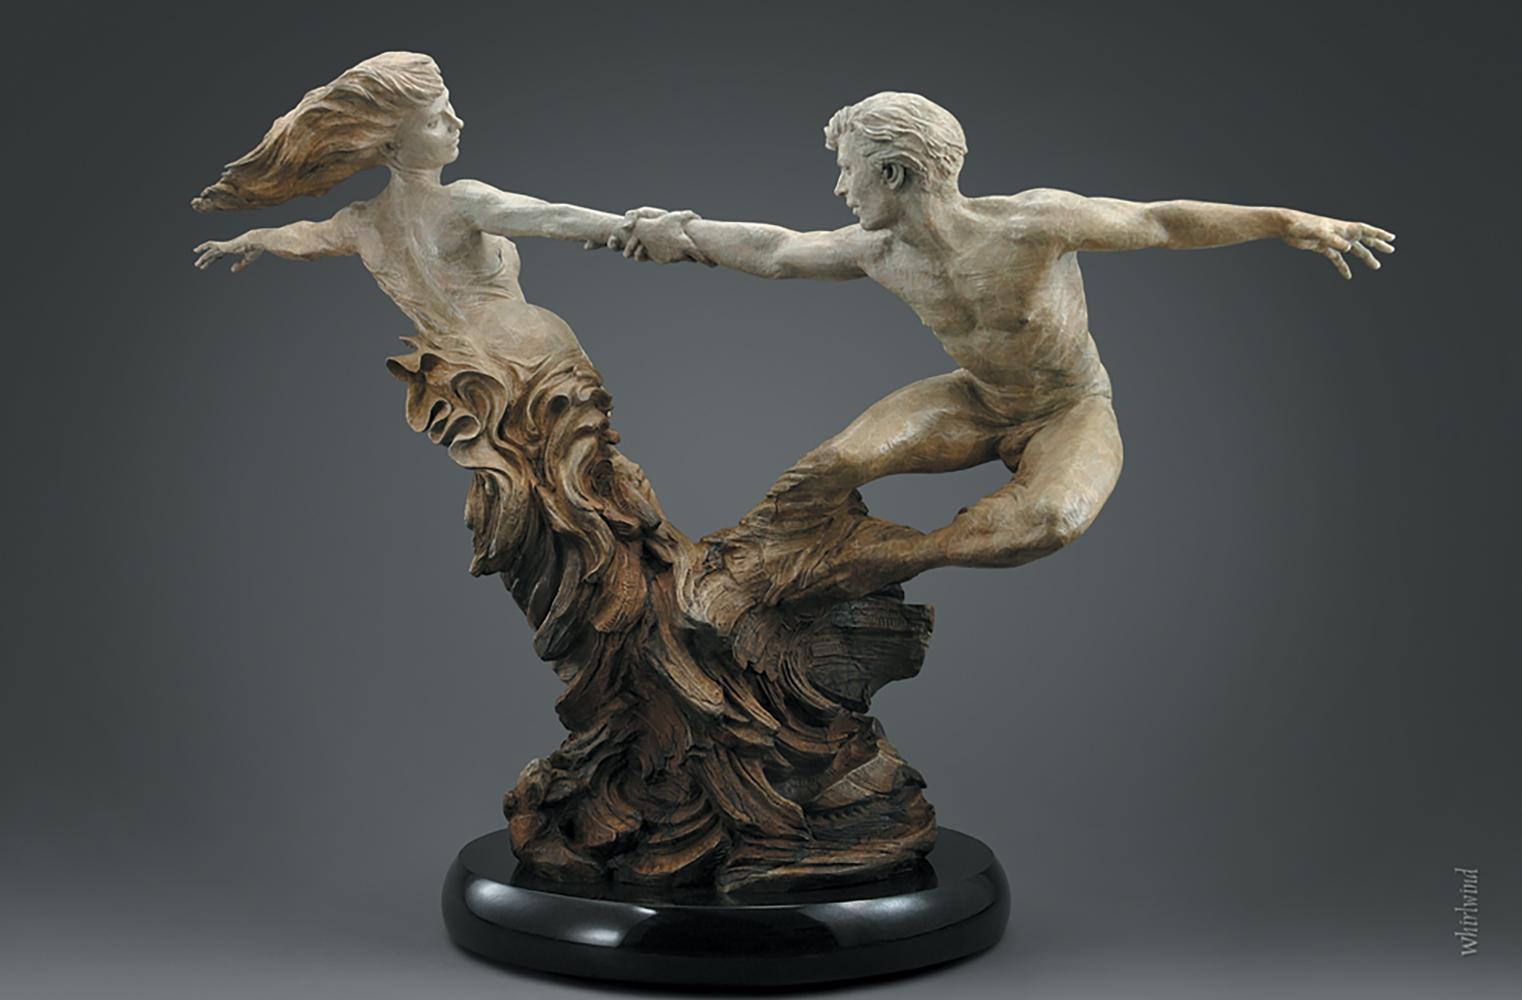 """Whirlwind"", Martin Eichinger, Figurative, Bronze, Romantic, 54x84x72 in."